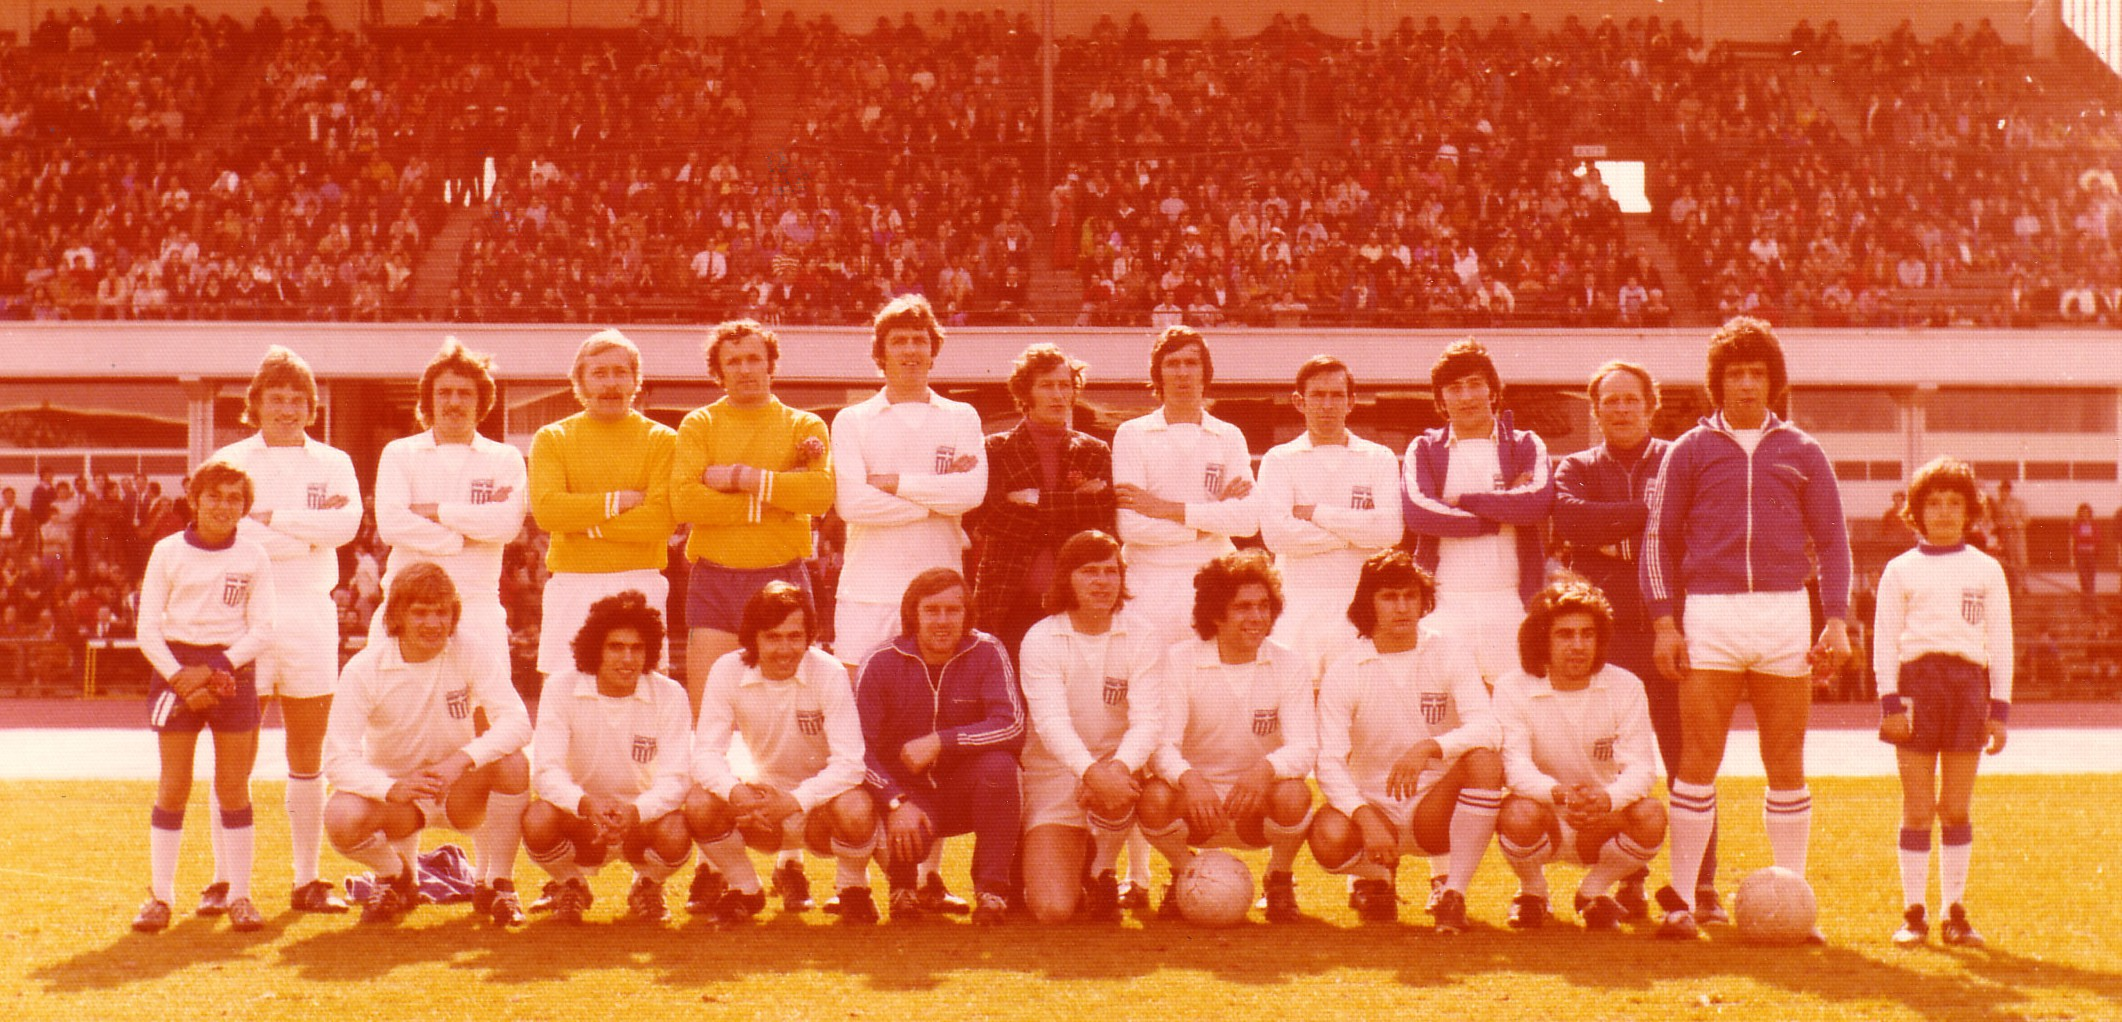 1976-team-photo